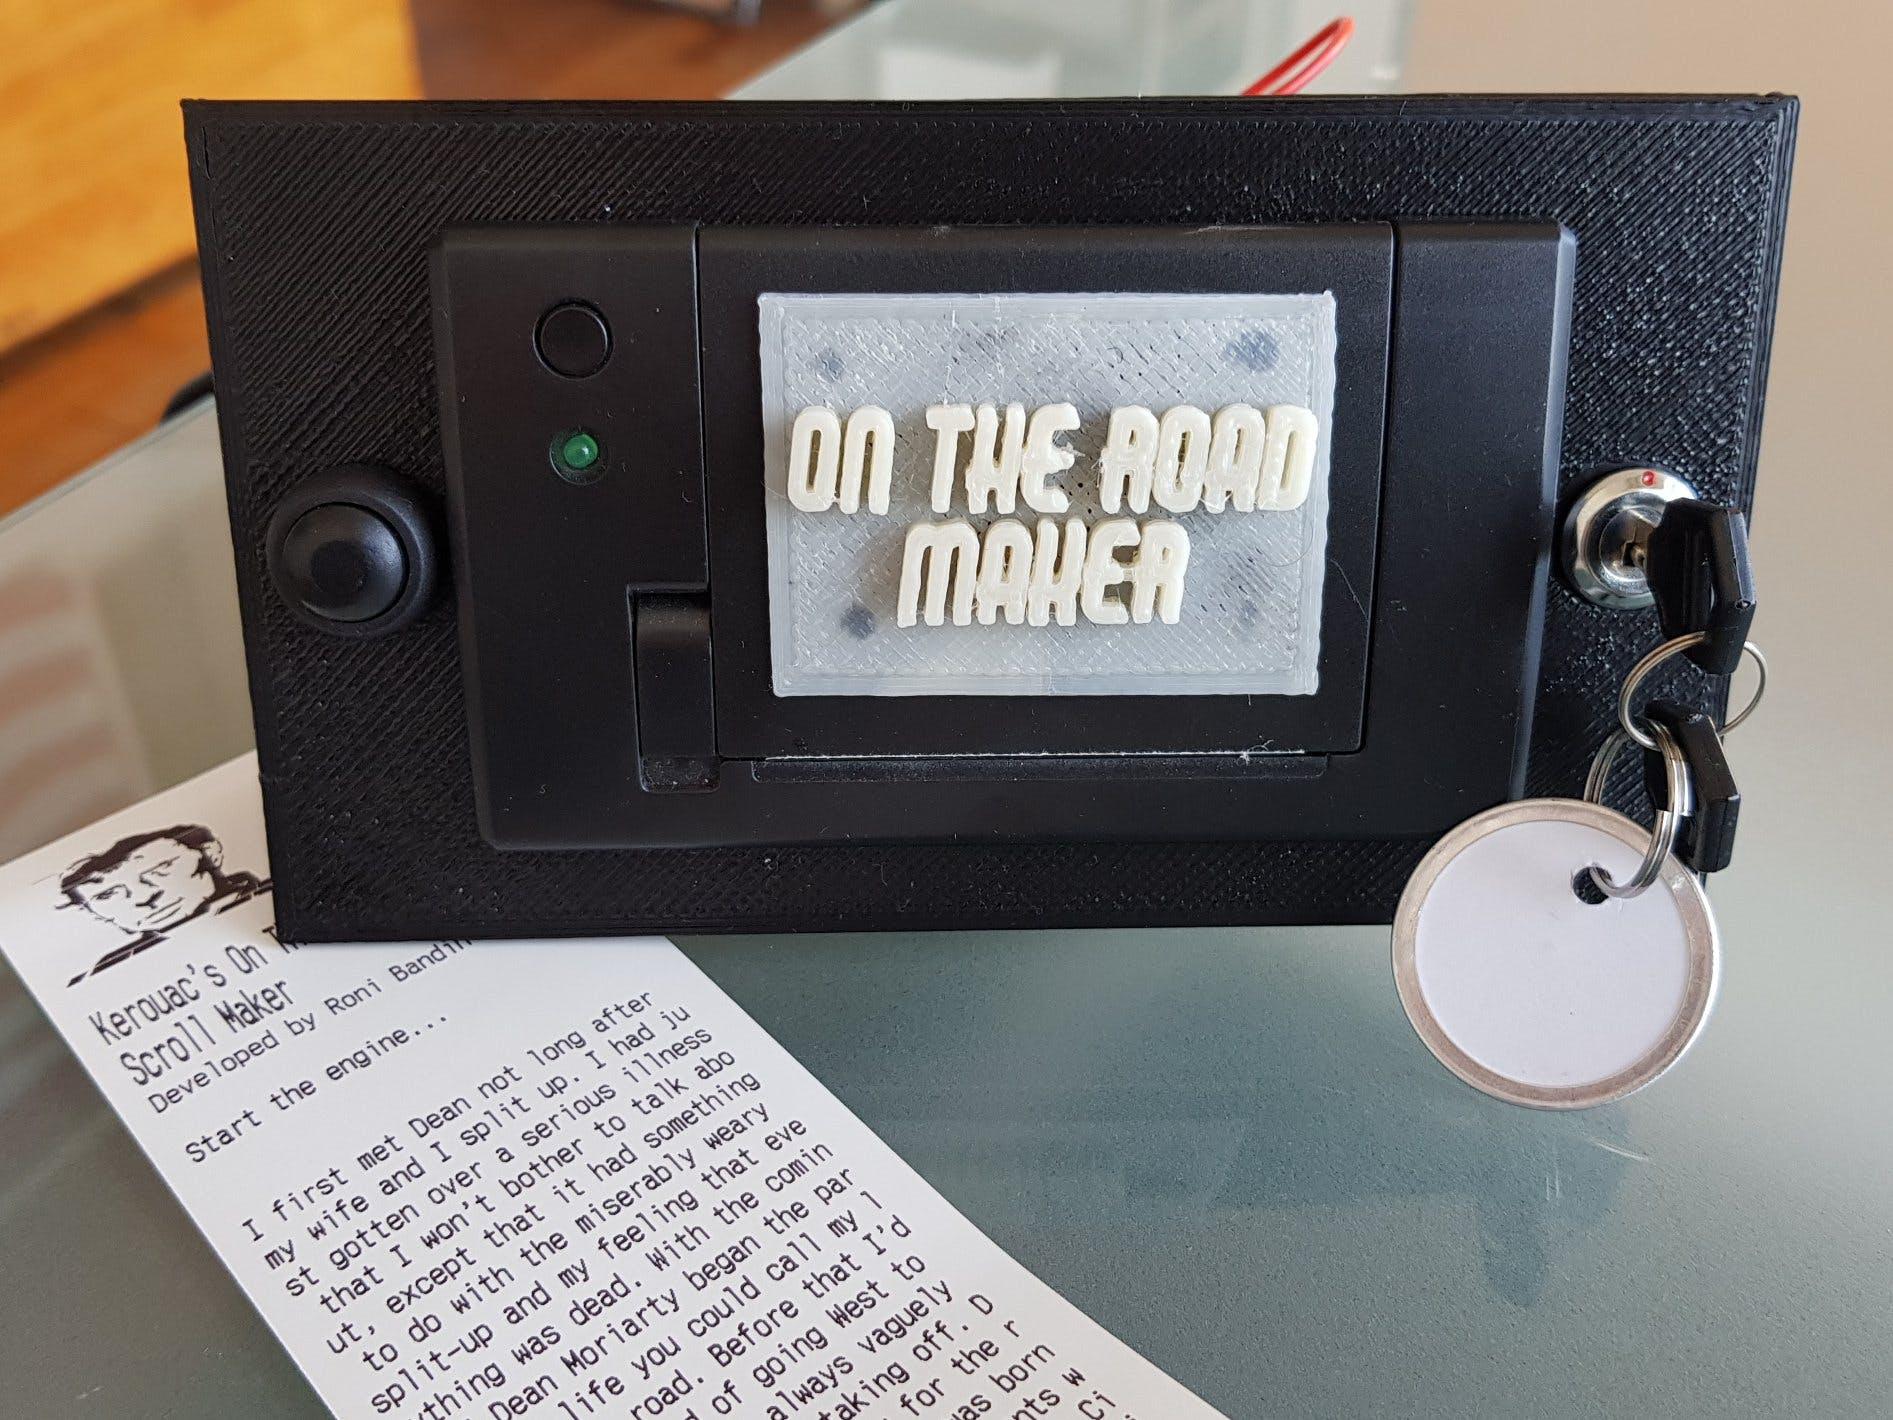 Jack Kerouac's On The Road Scroll Maker